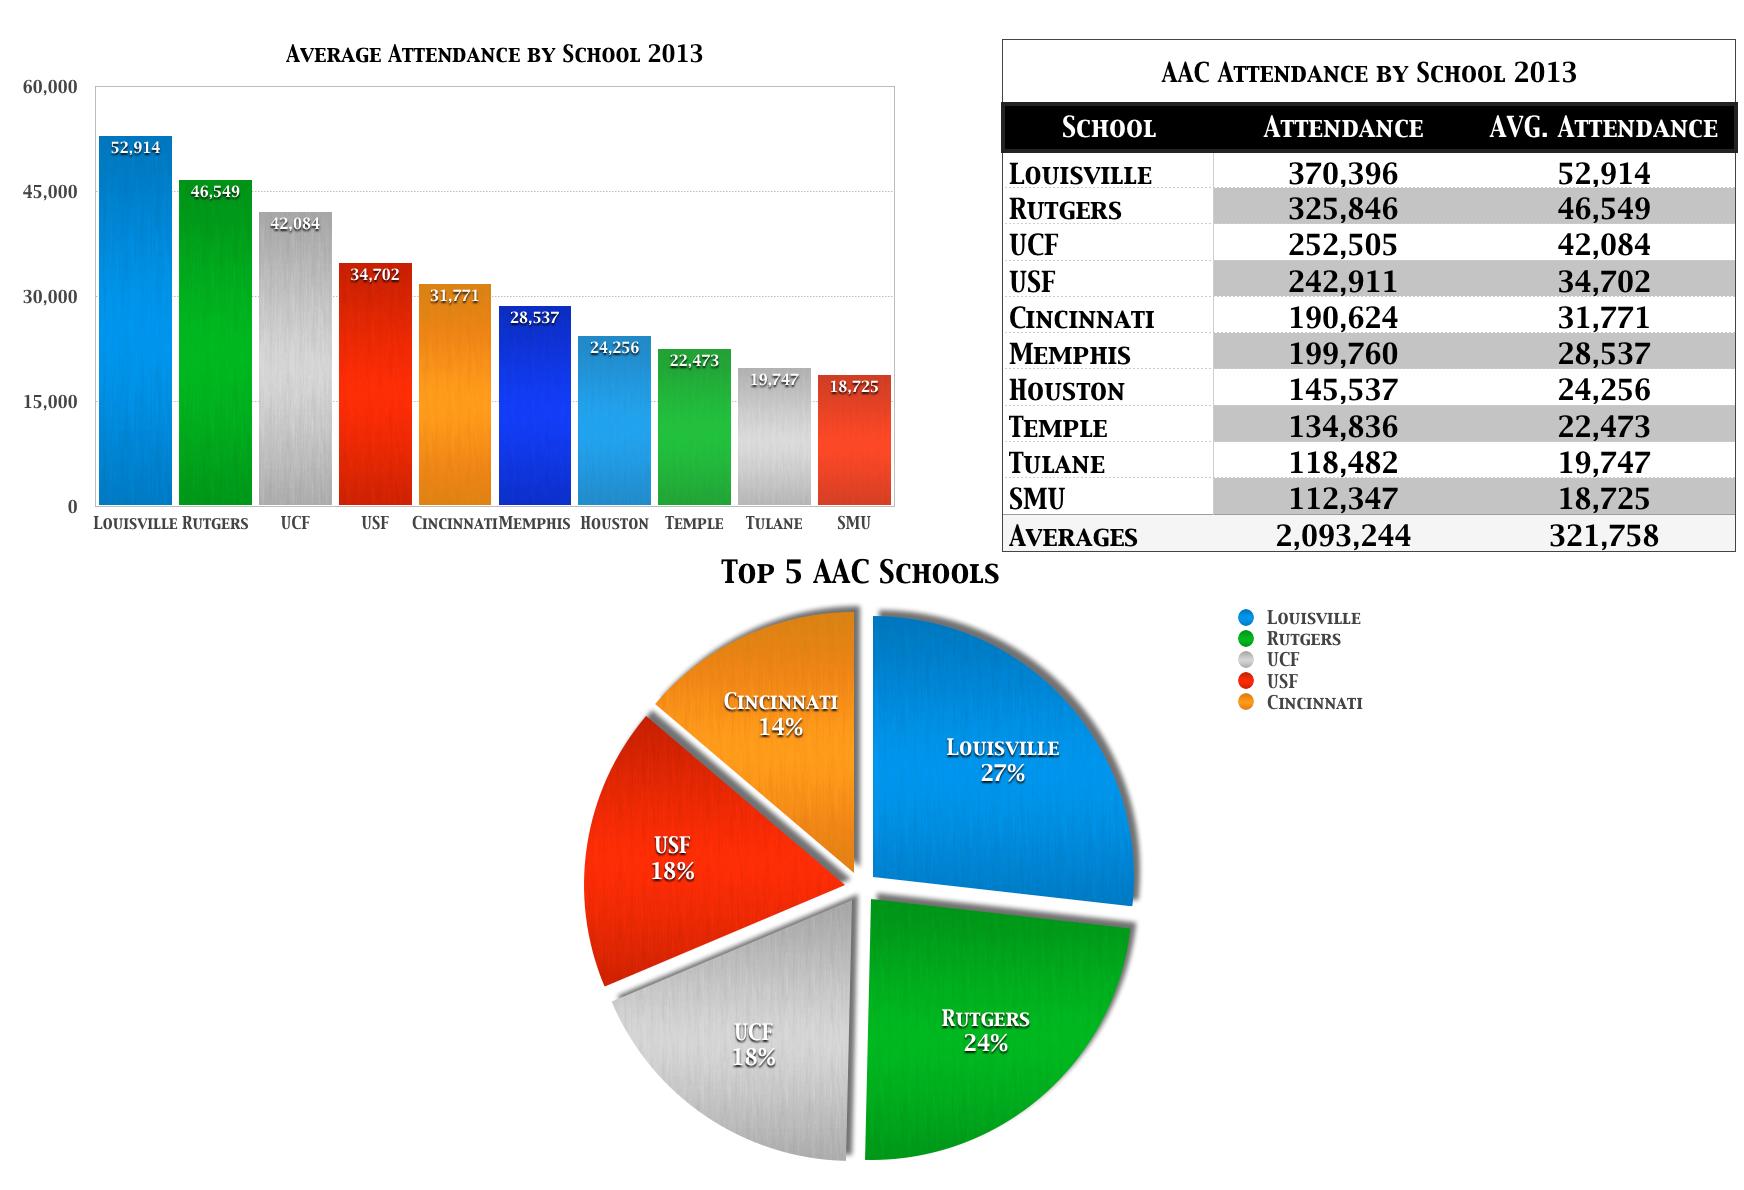 AAC Attendance by School 2013 | SoFloBulls.com